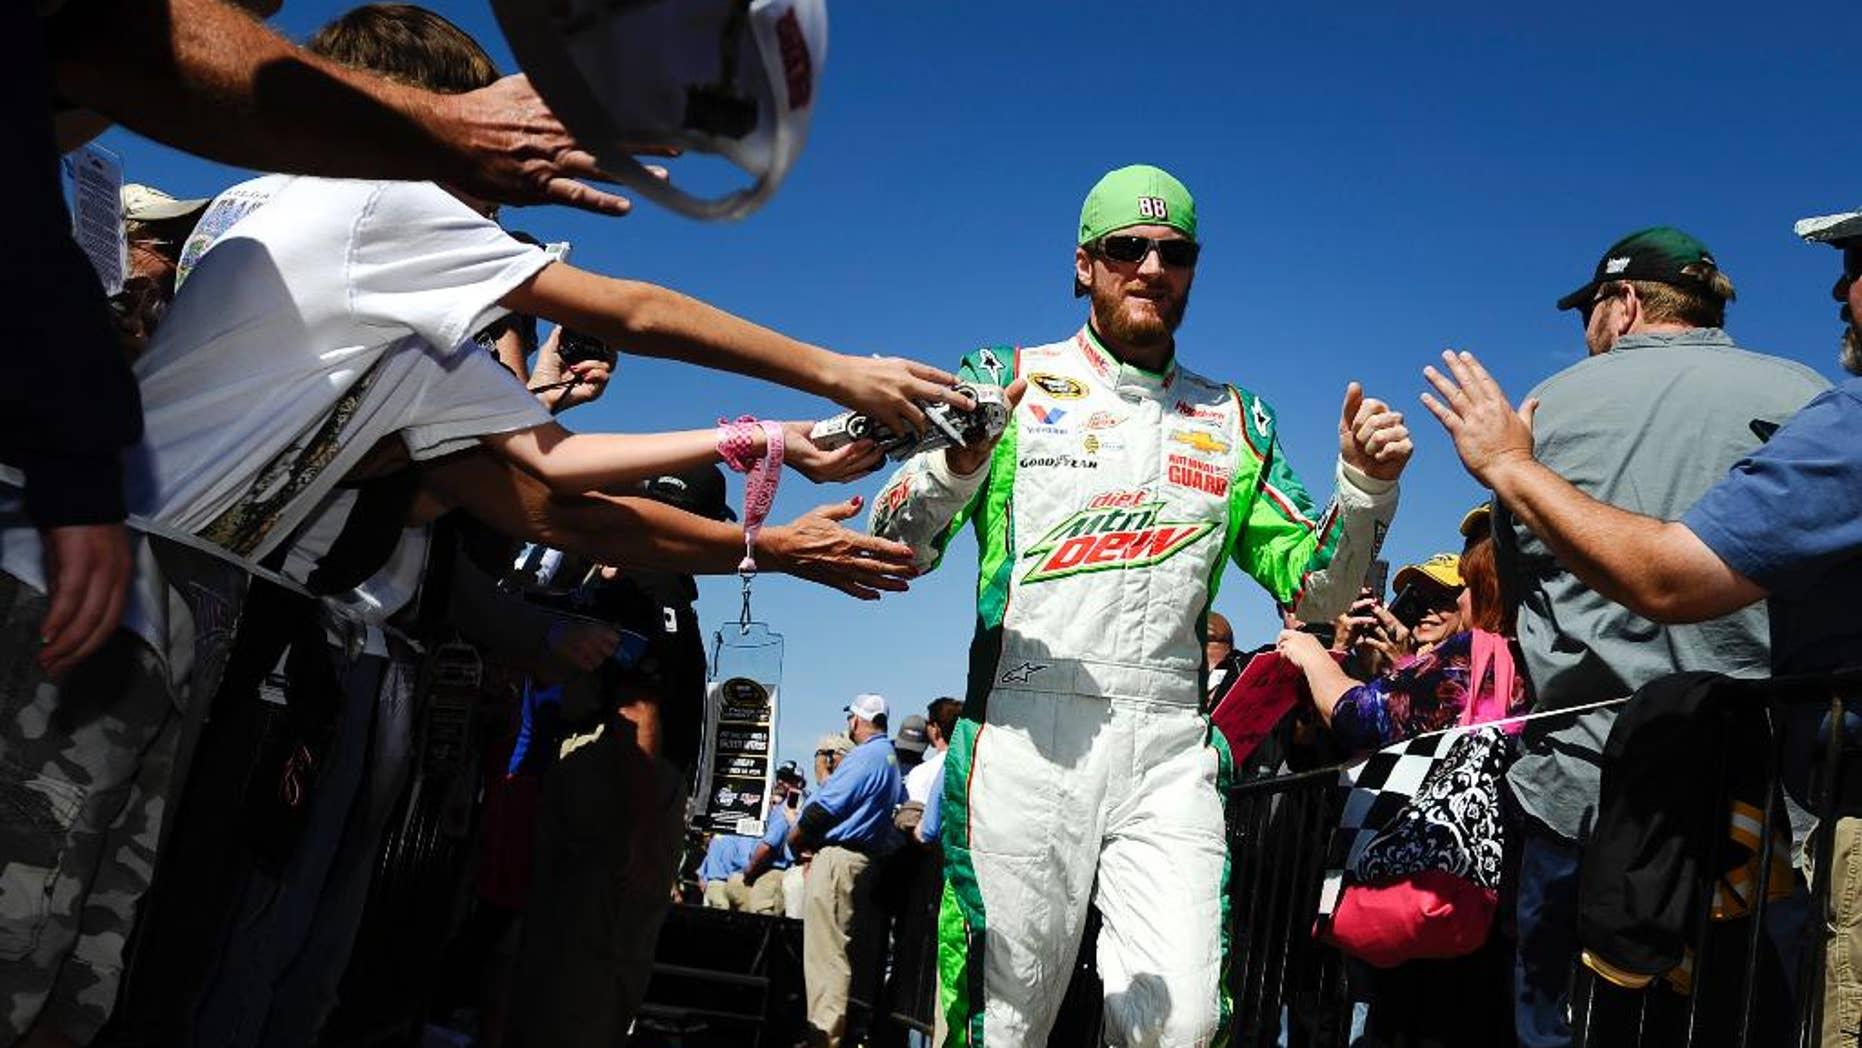 Brad Keselowski prepares for the start of the NASCAR Sprint Cup Series auto race at Talladega Superspeedway, Sunday, Oct. 19, 2014, in Talladega, Ala. (AP Photo/Rainier Ehrhardt)